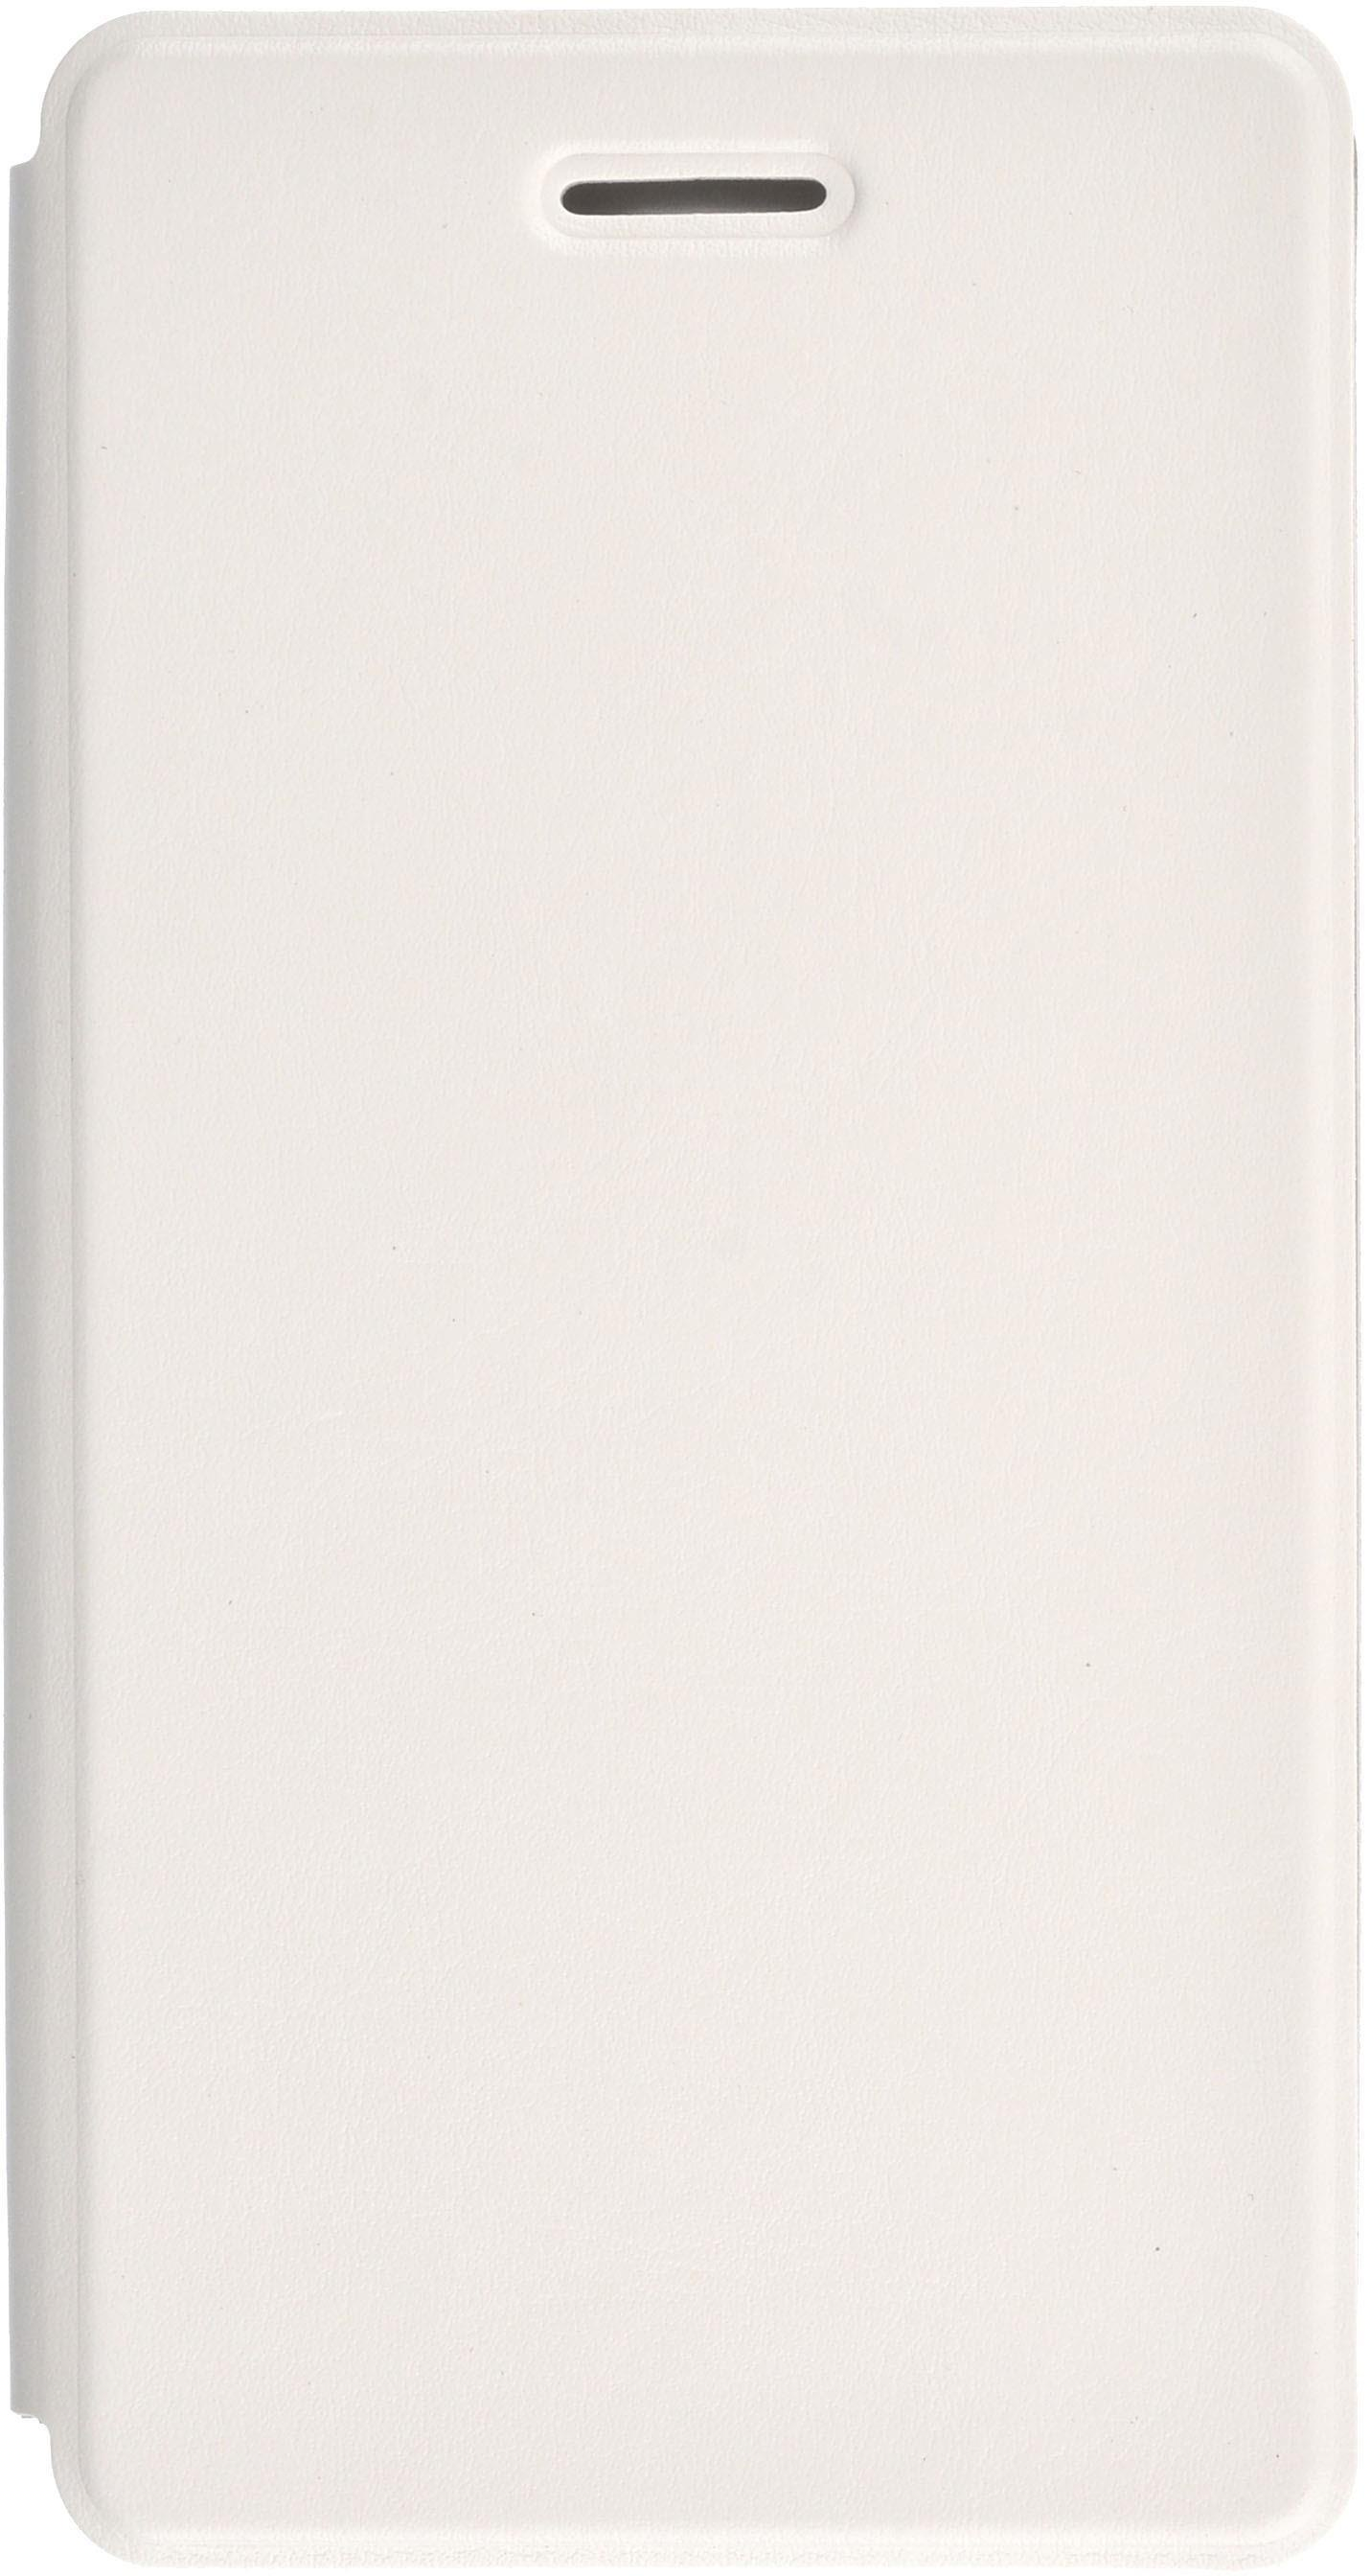 Чехол для сотового телефона skinBOX Lux, 4630042527669, белый nokia cc 3096 чехол для lumia 435 532 bright green